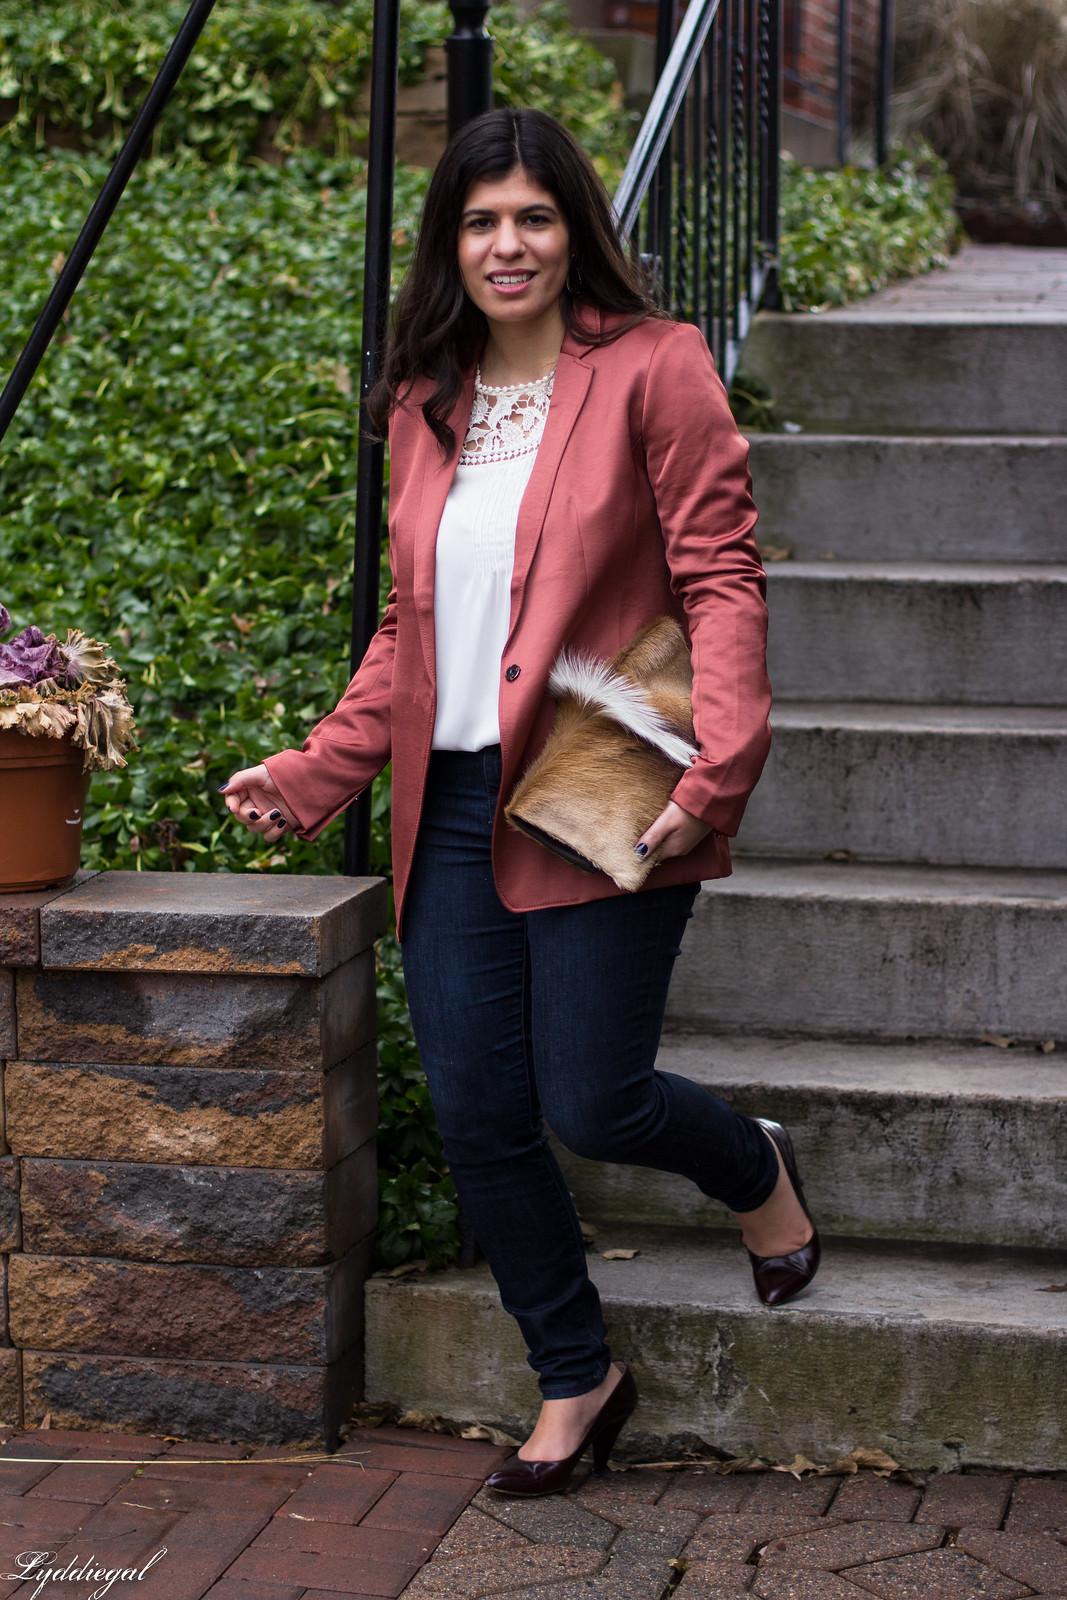 rust silk boyfriend blazer, springbok clutch, lace blouse-14.jpg